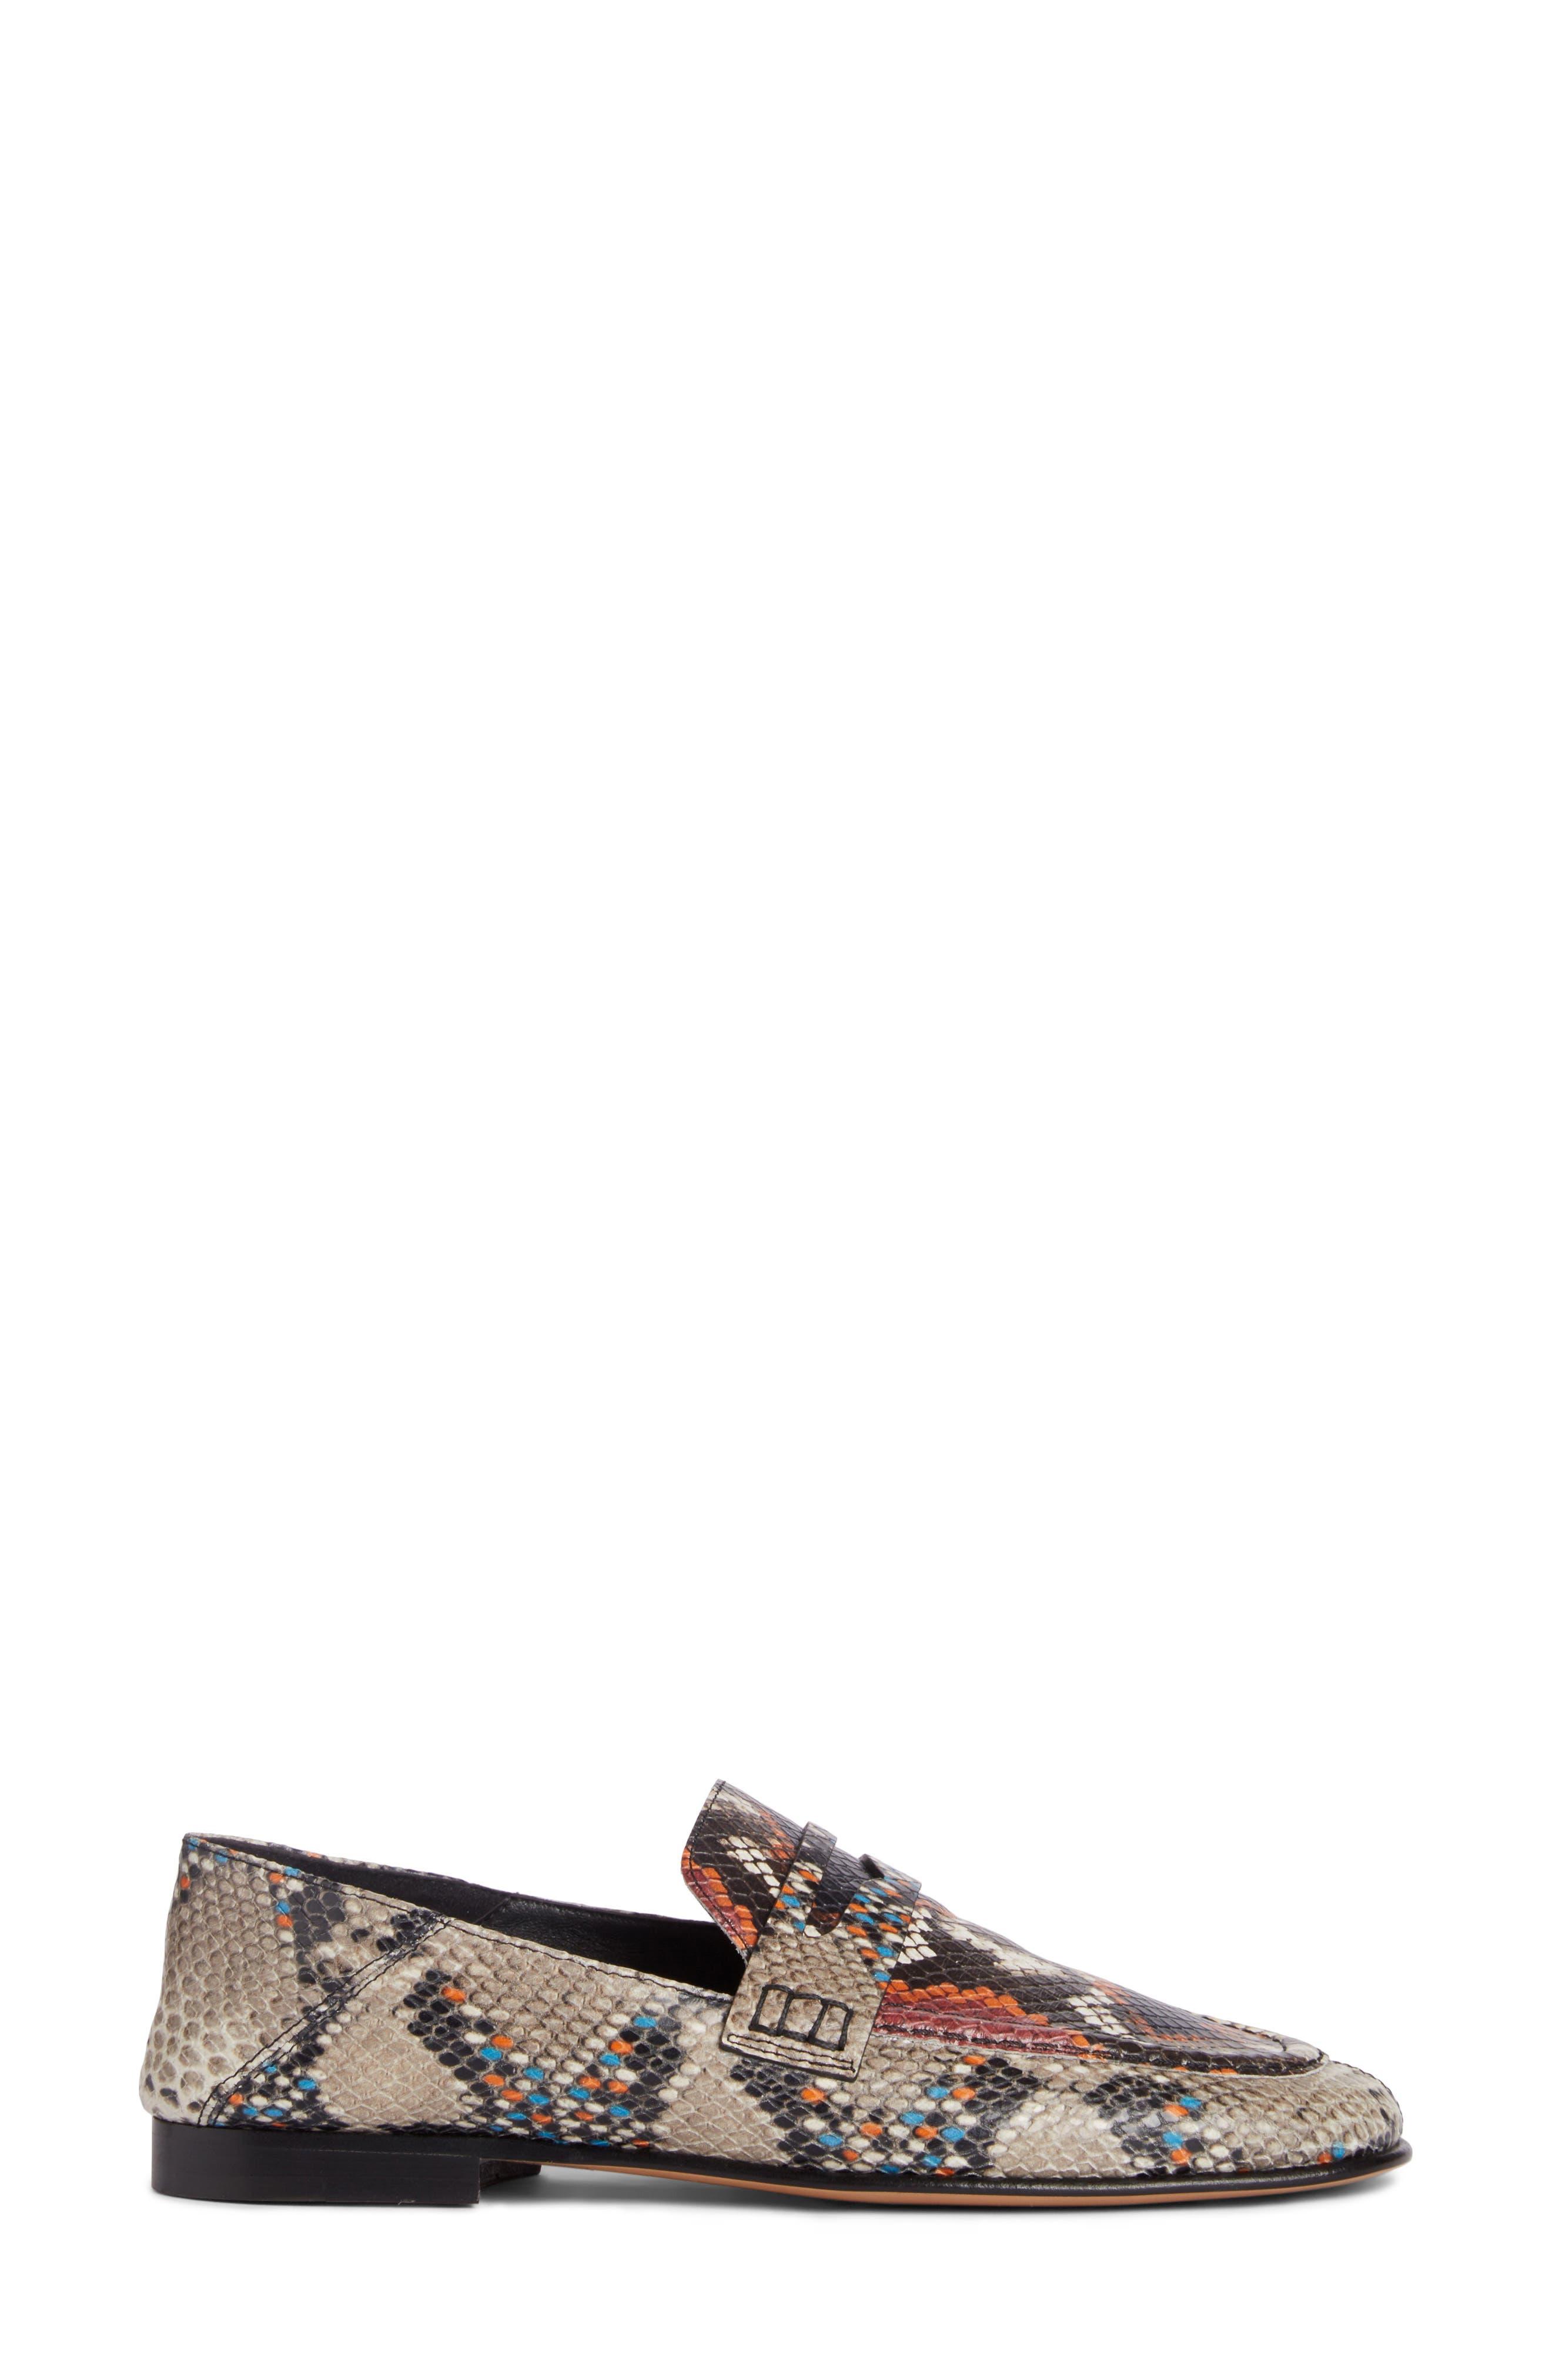 Fezzy Snakeskin Embossed Convertible Loafer,                             Alternate thumbnail 5, color,